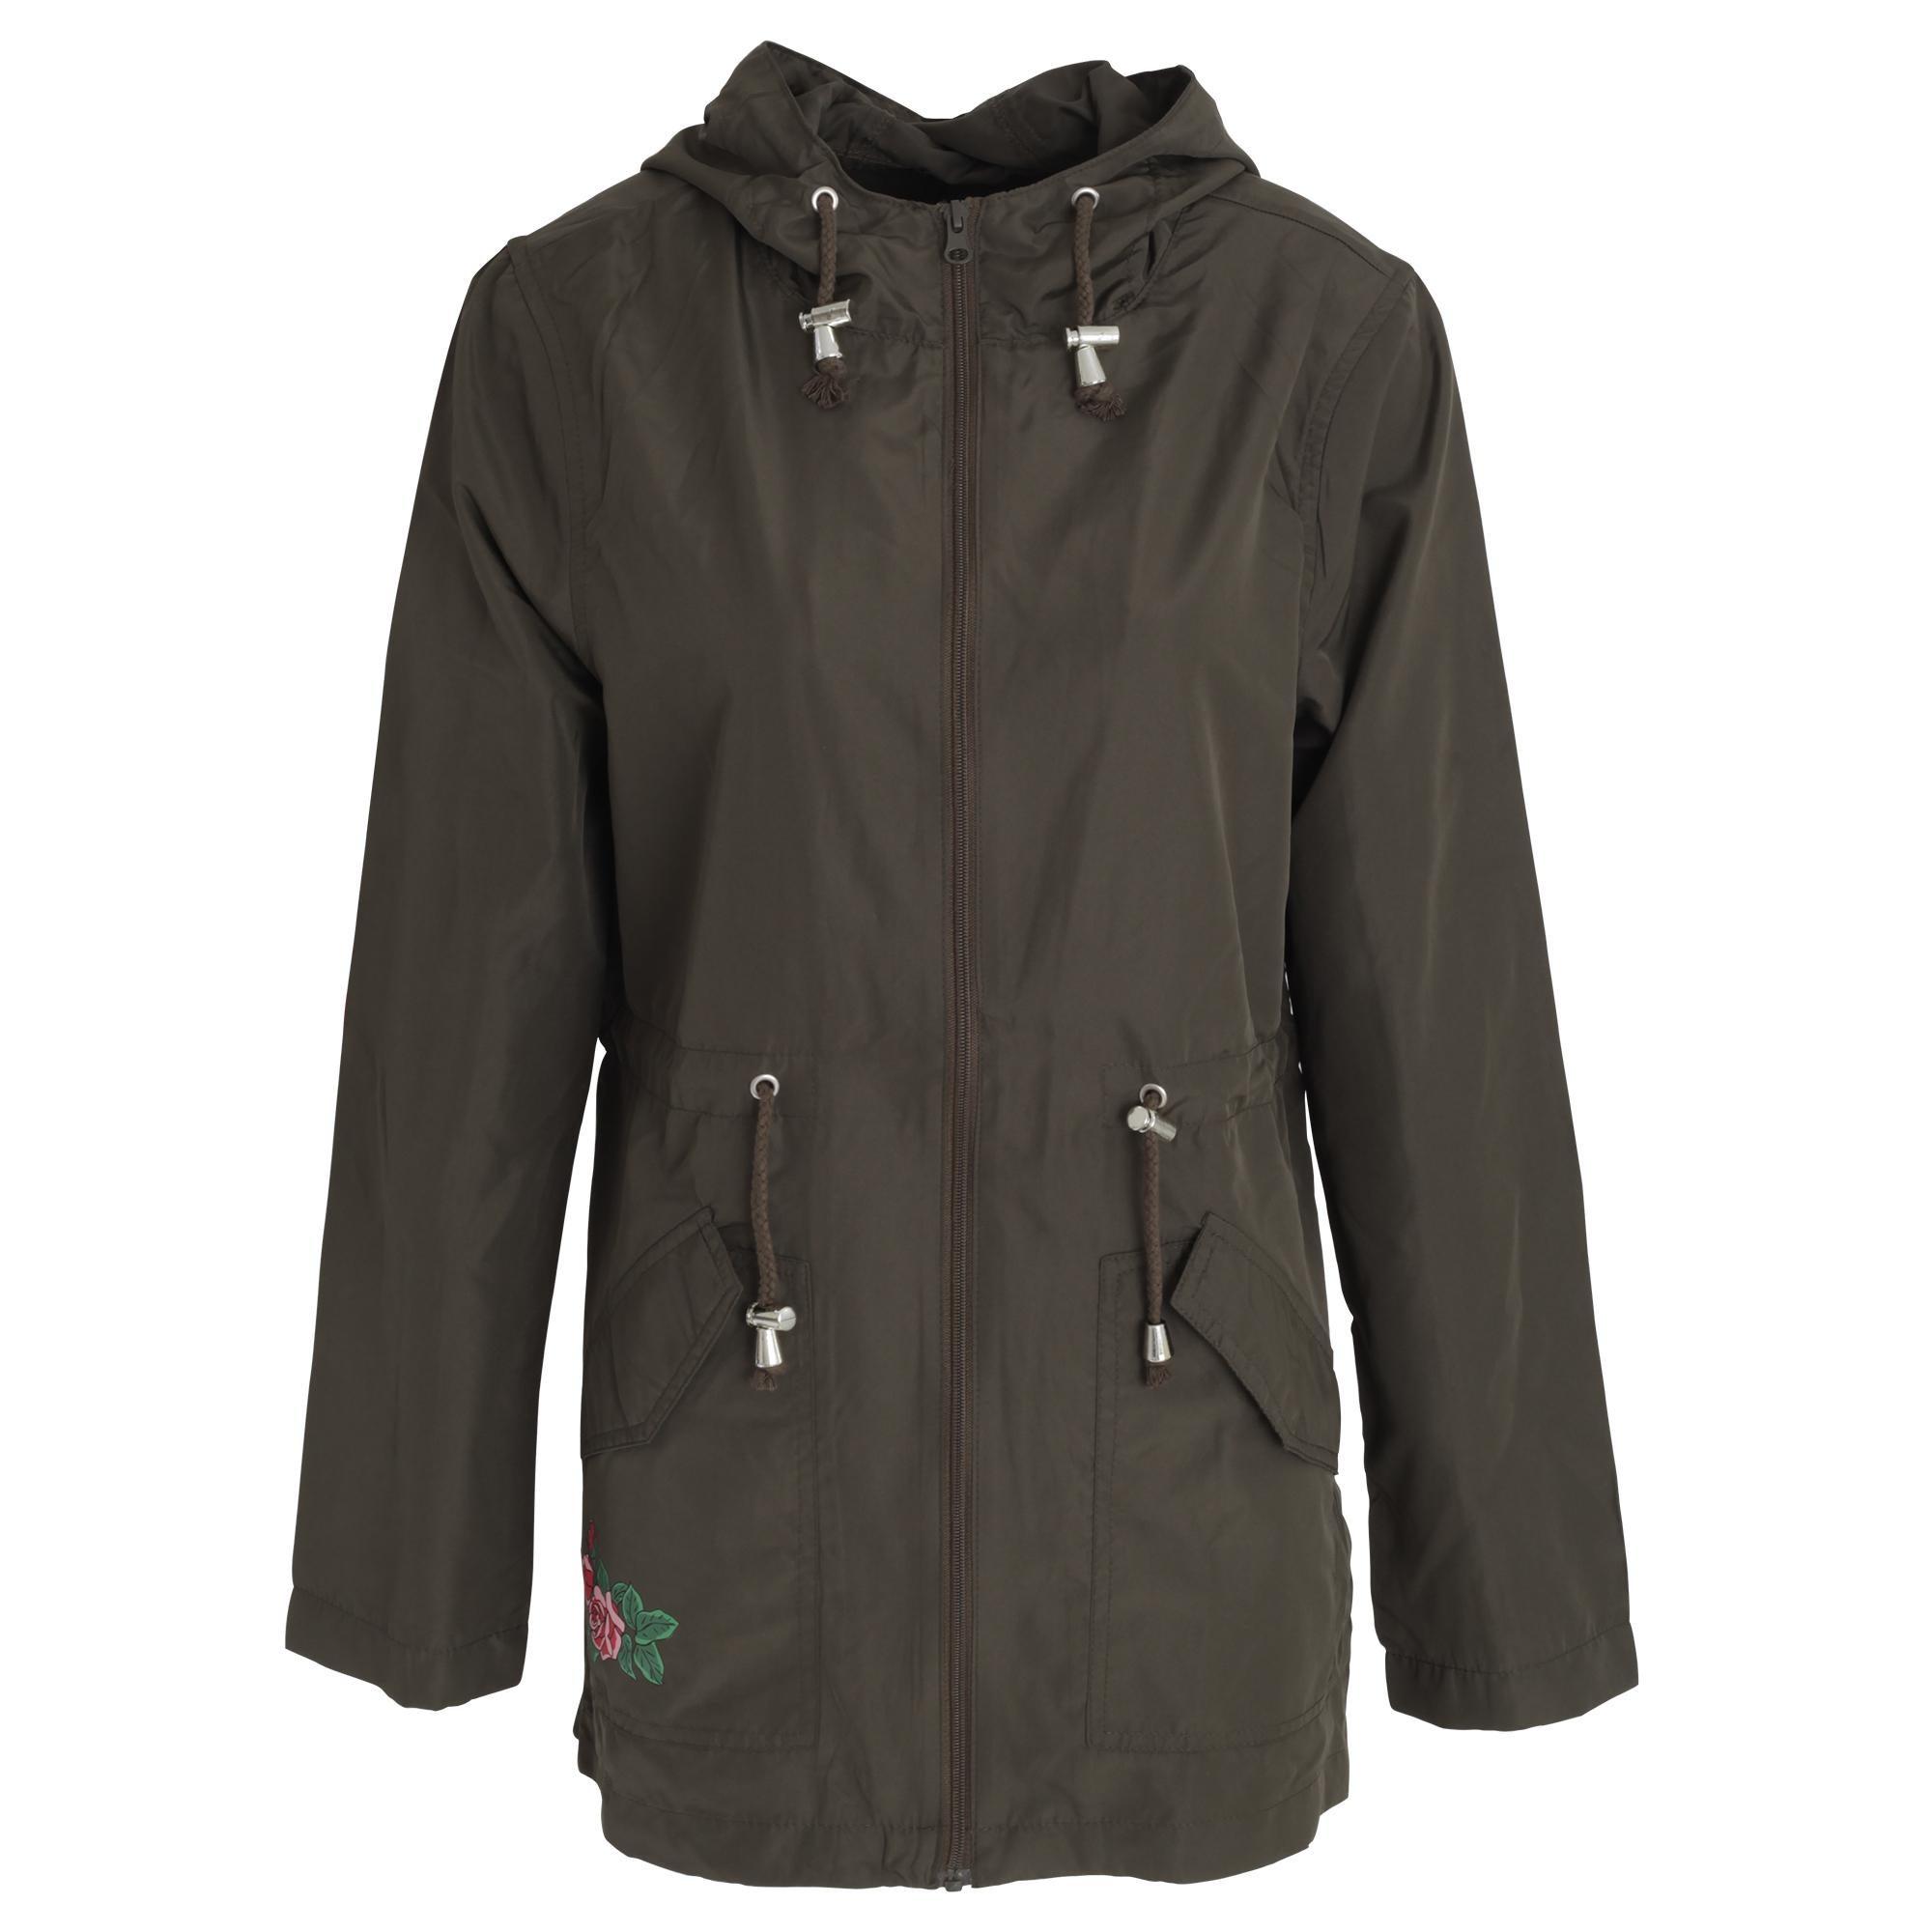 Brave Soul Childrens//Girls Safari Full Zip Parka Jacket